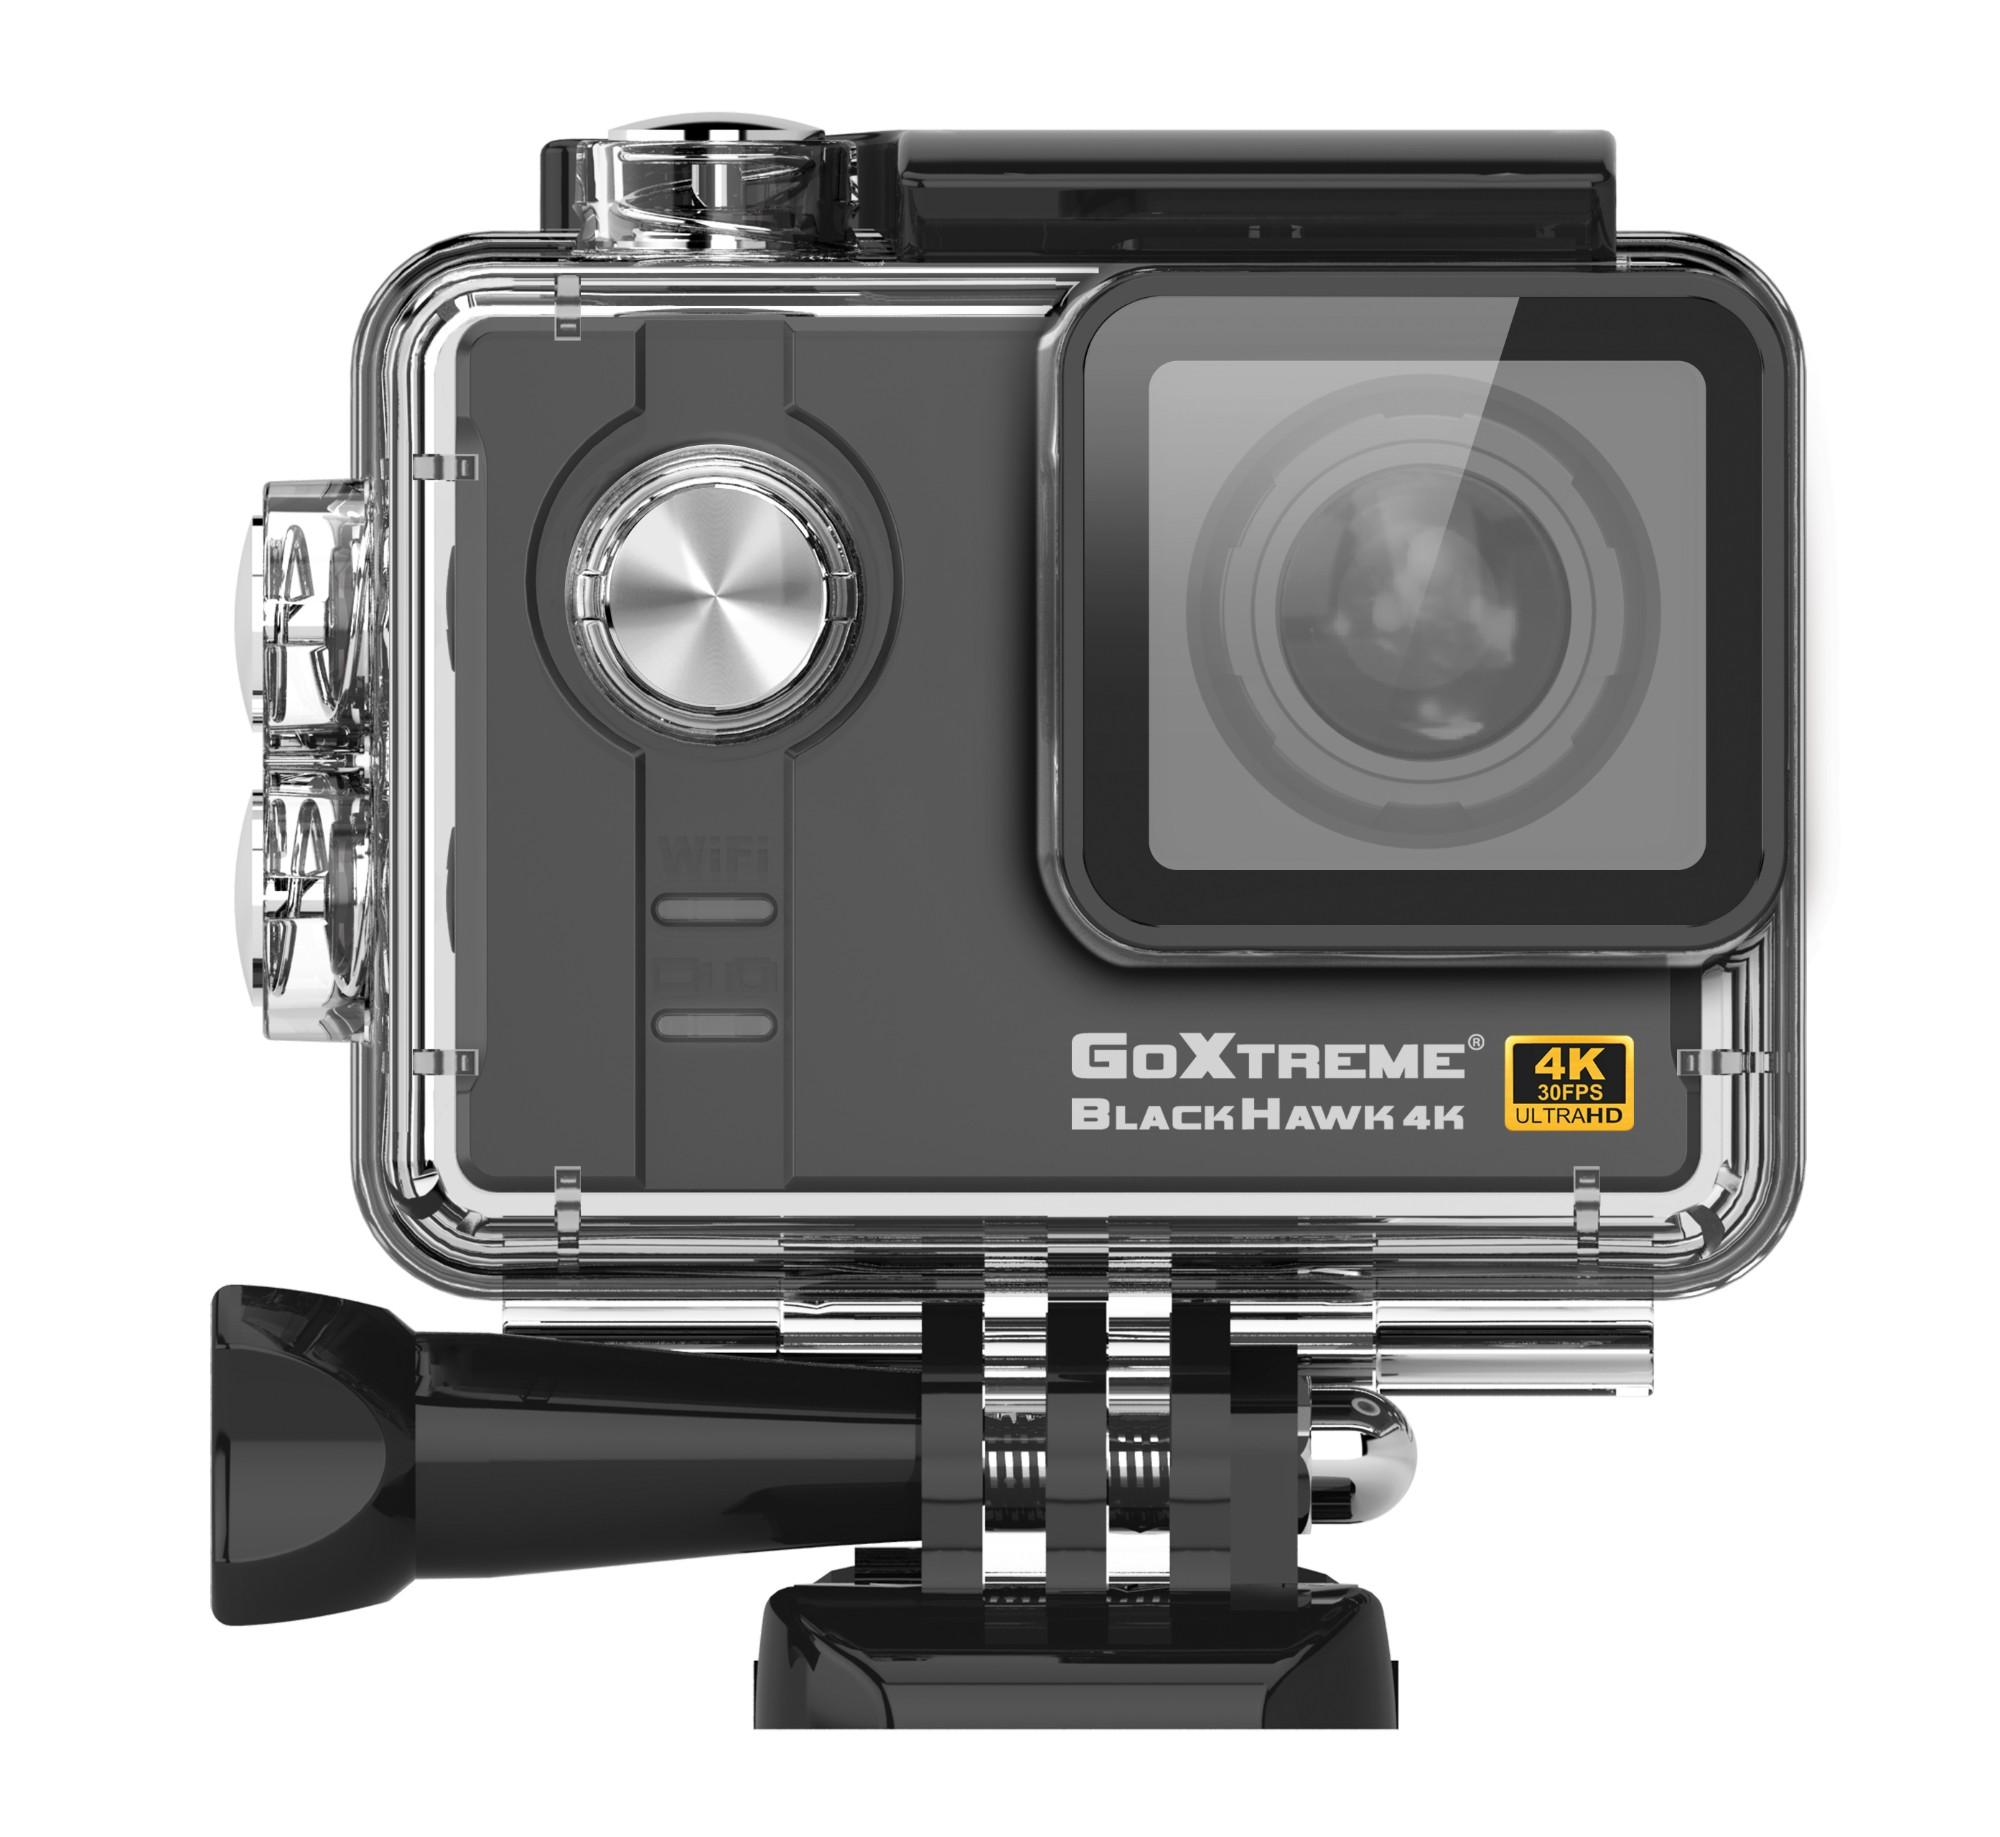 Easypix GoXtreme BlackHawk 12.4MP 4K Ultra HD Wi-Fi action sports camera